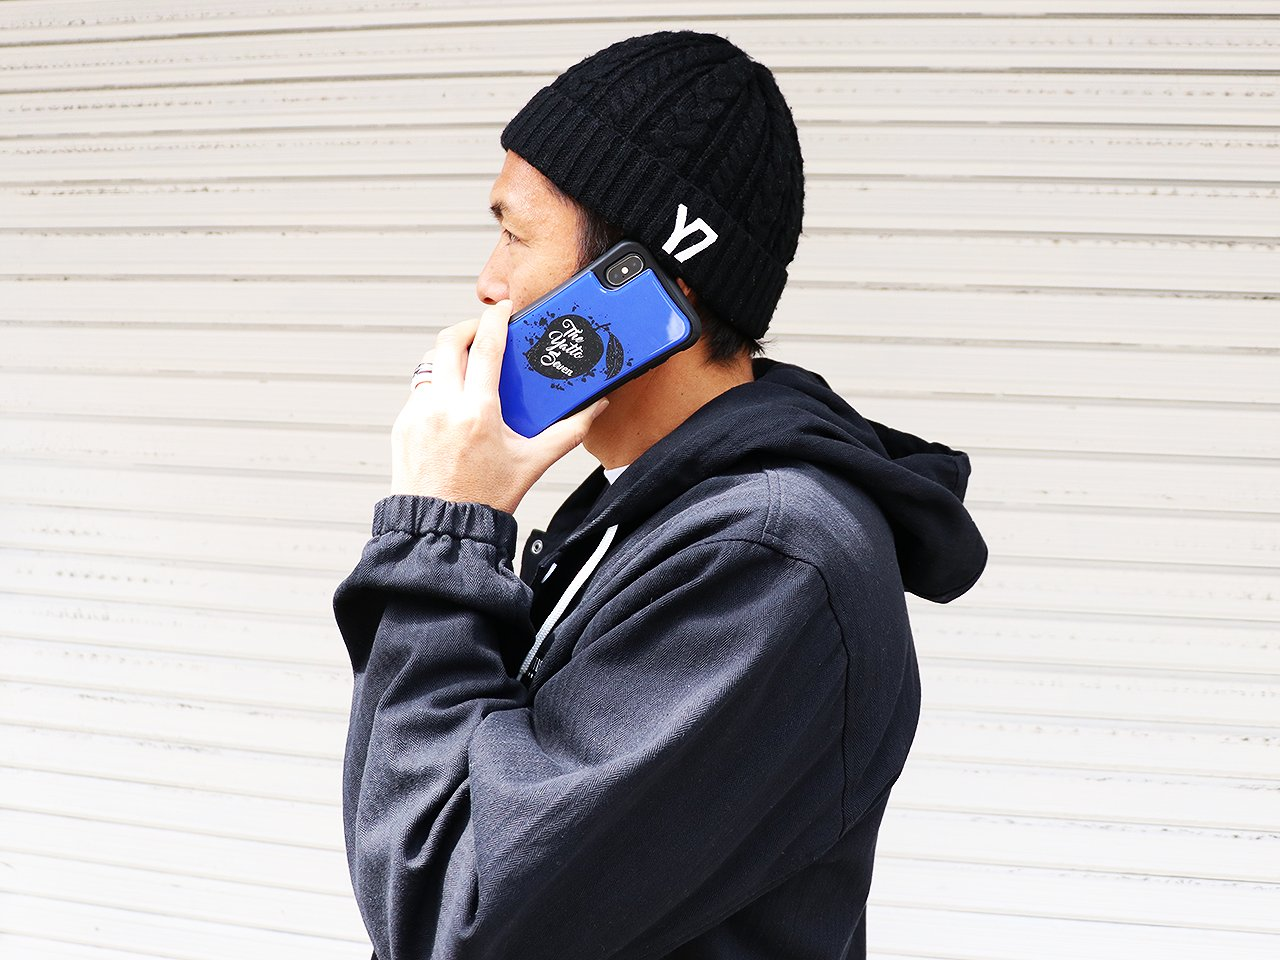 iPhoneケース(Yatto7×WAYLLY)